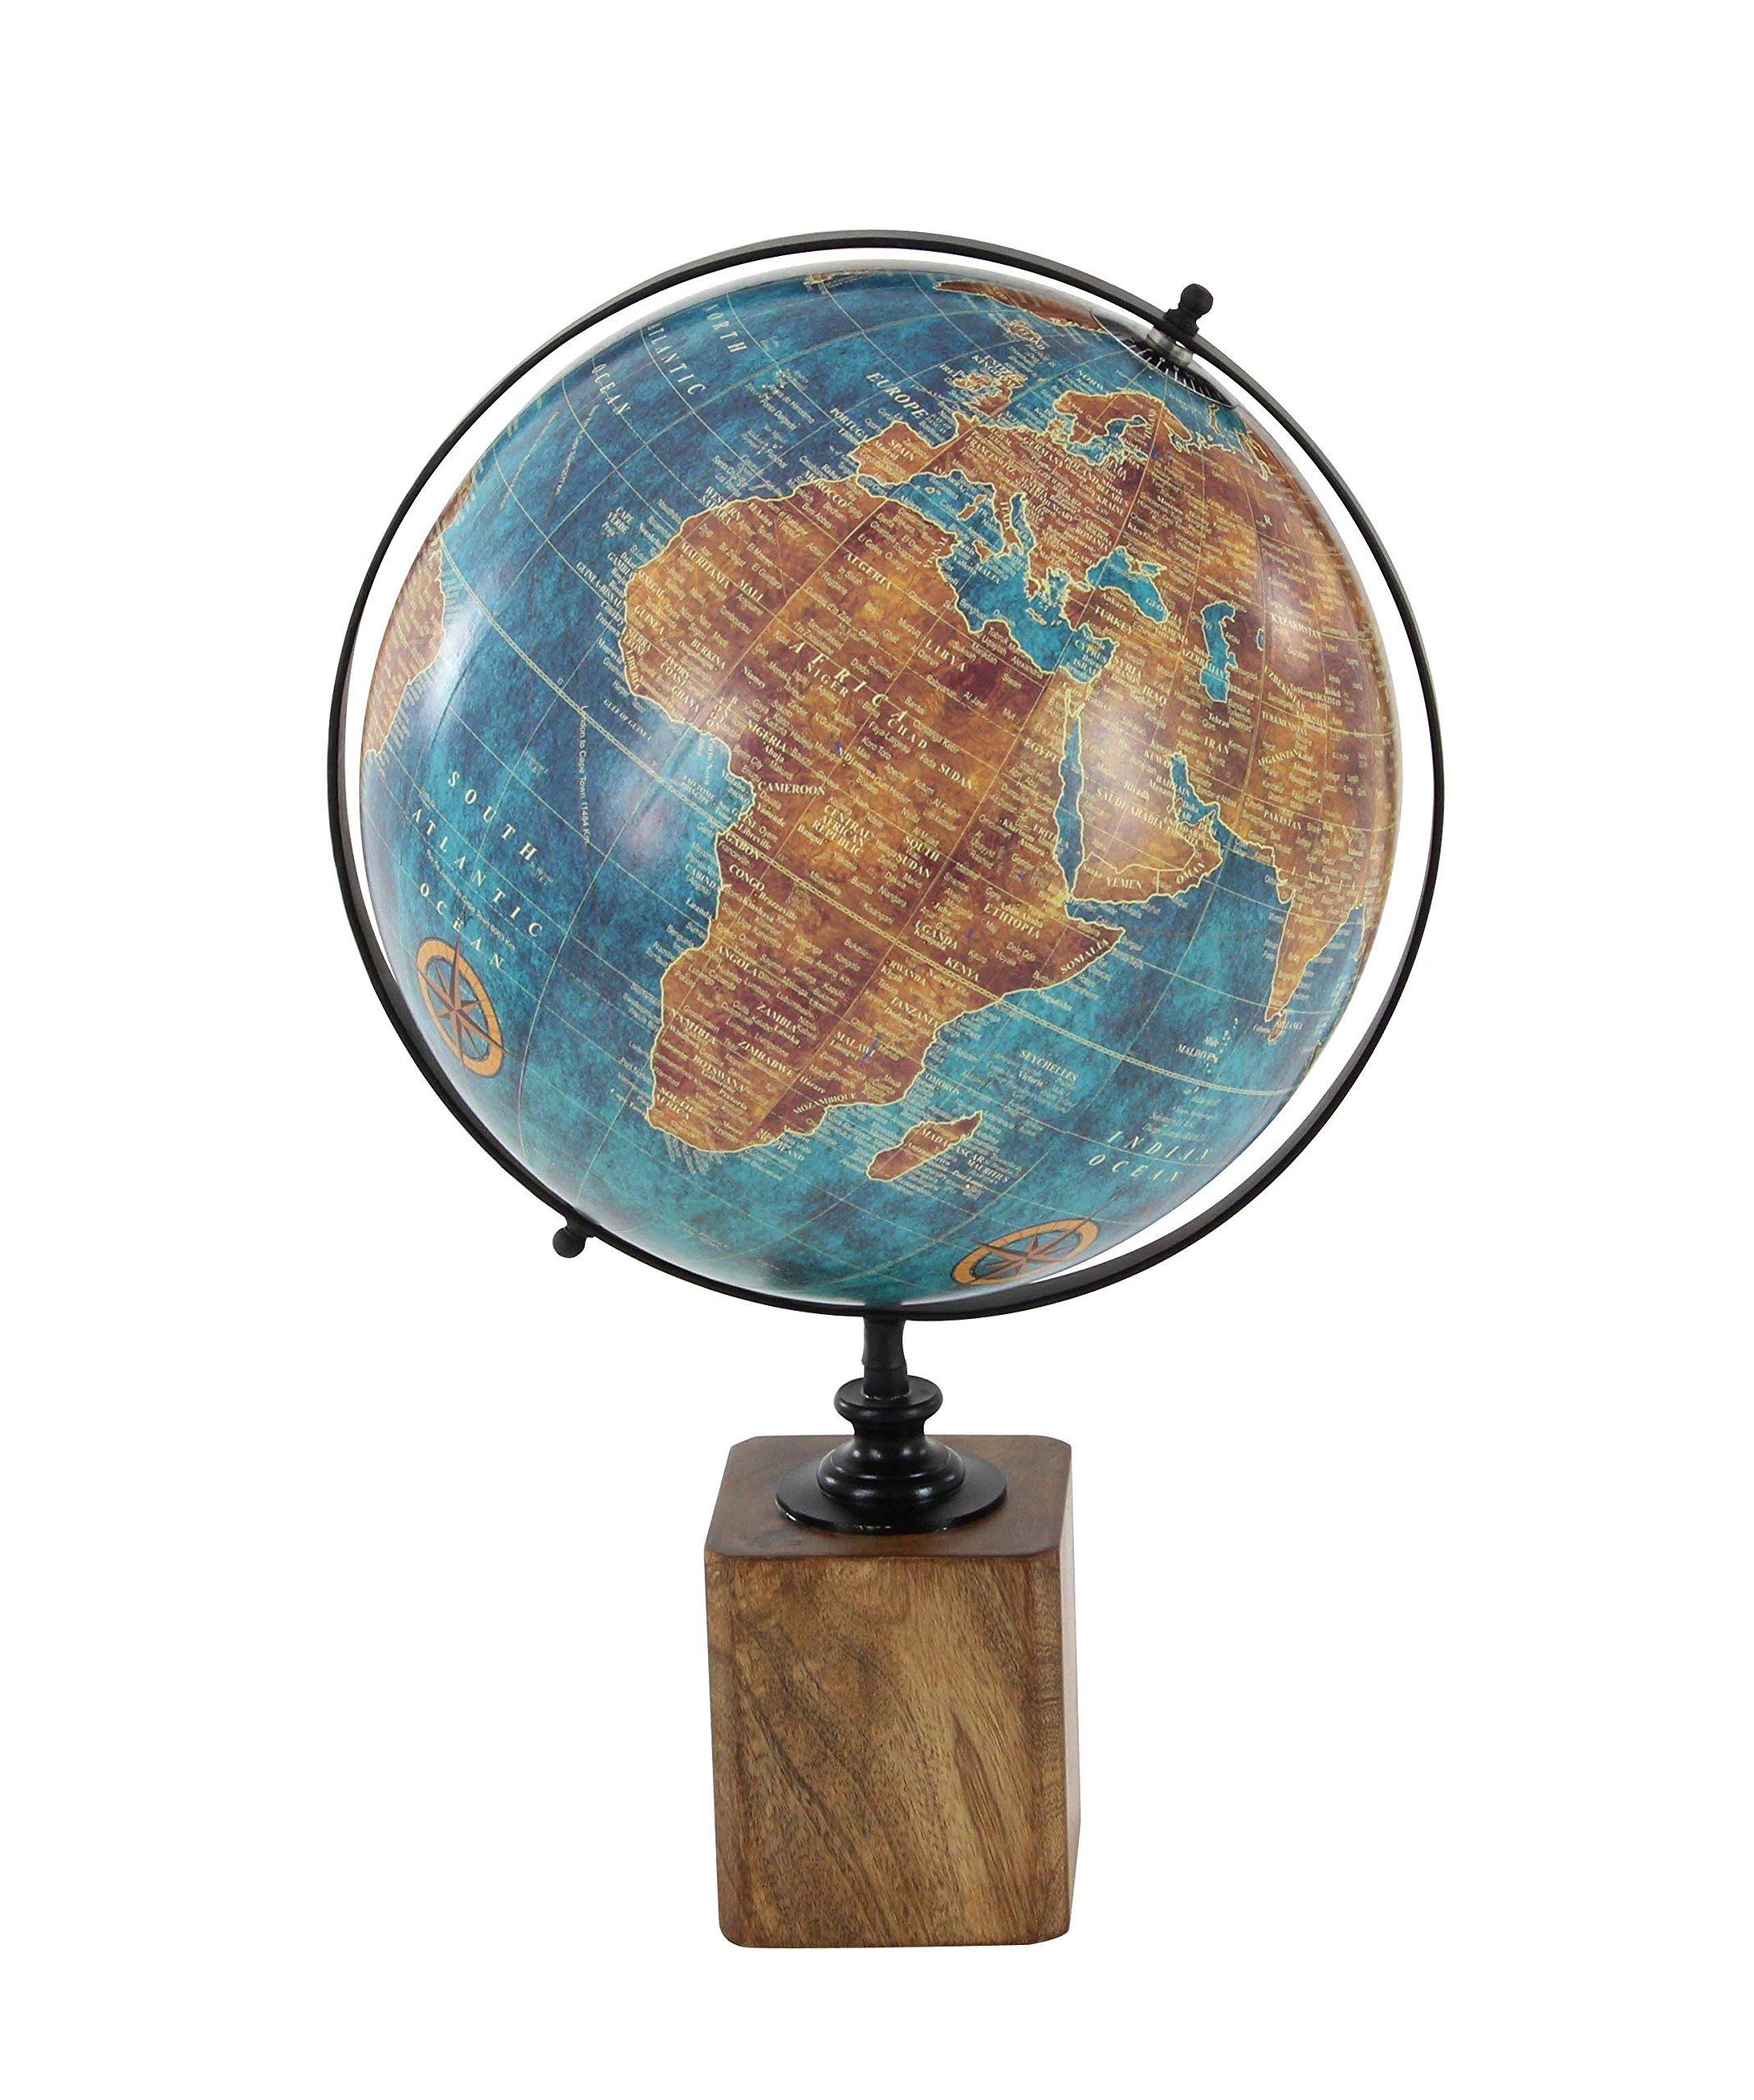 Deco 79 94545 Plastic and Mango Wood Decorative Globe, Blue/Black/Brown